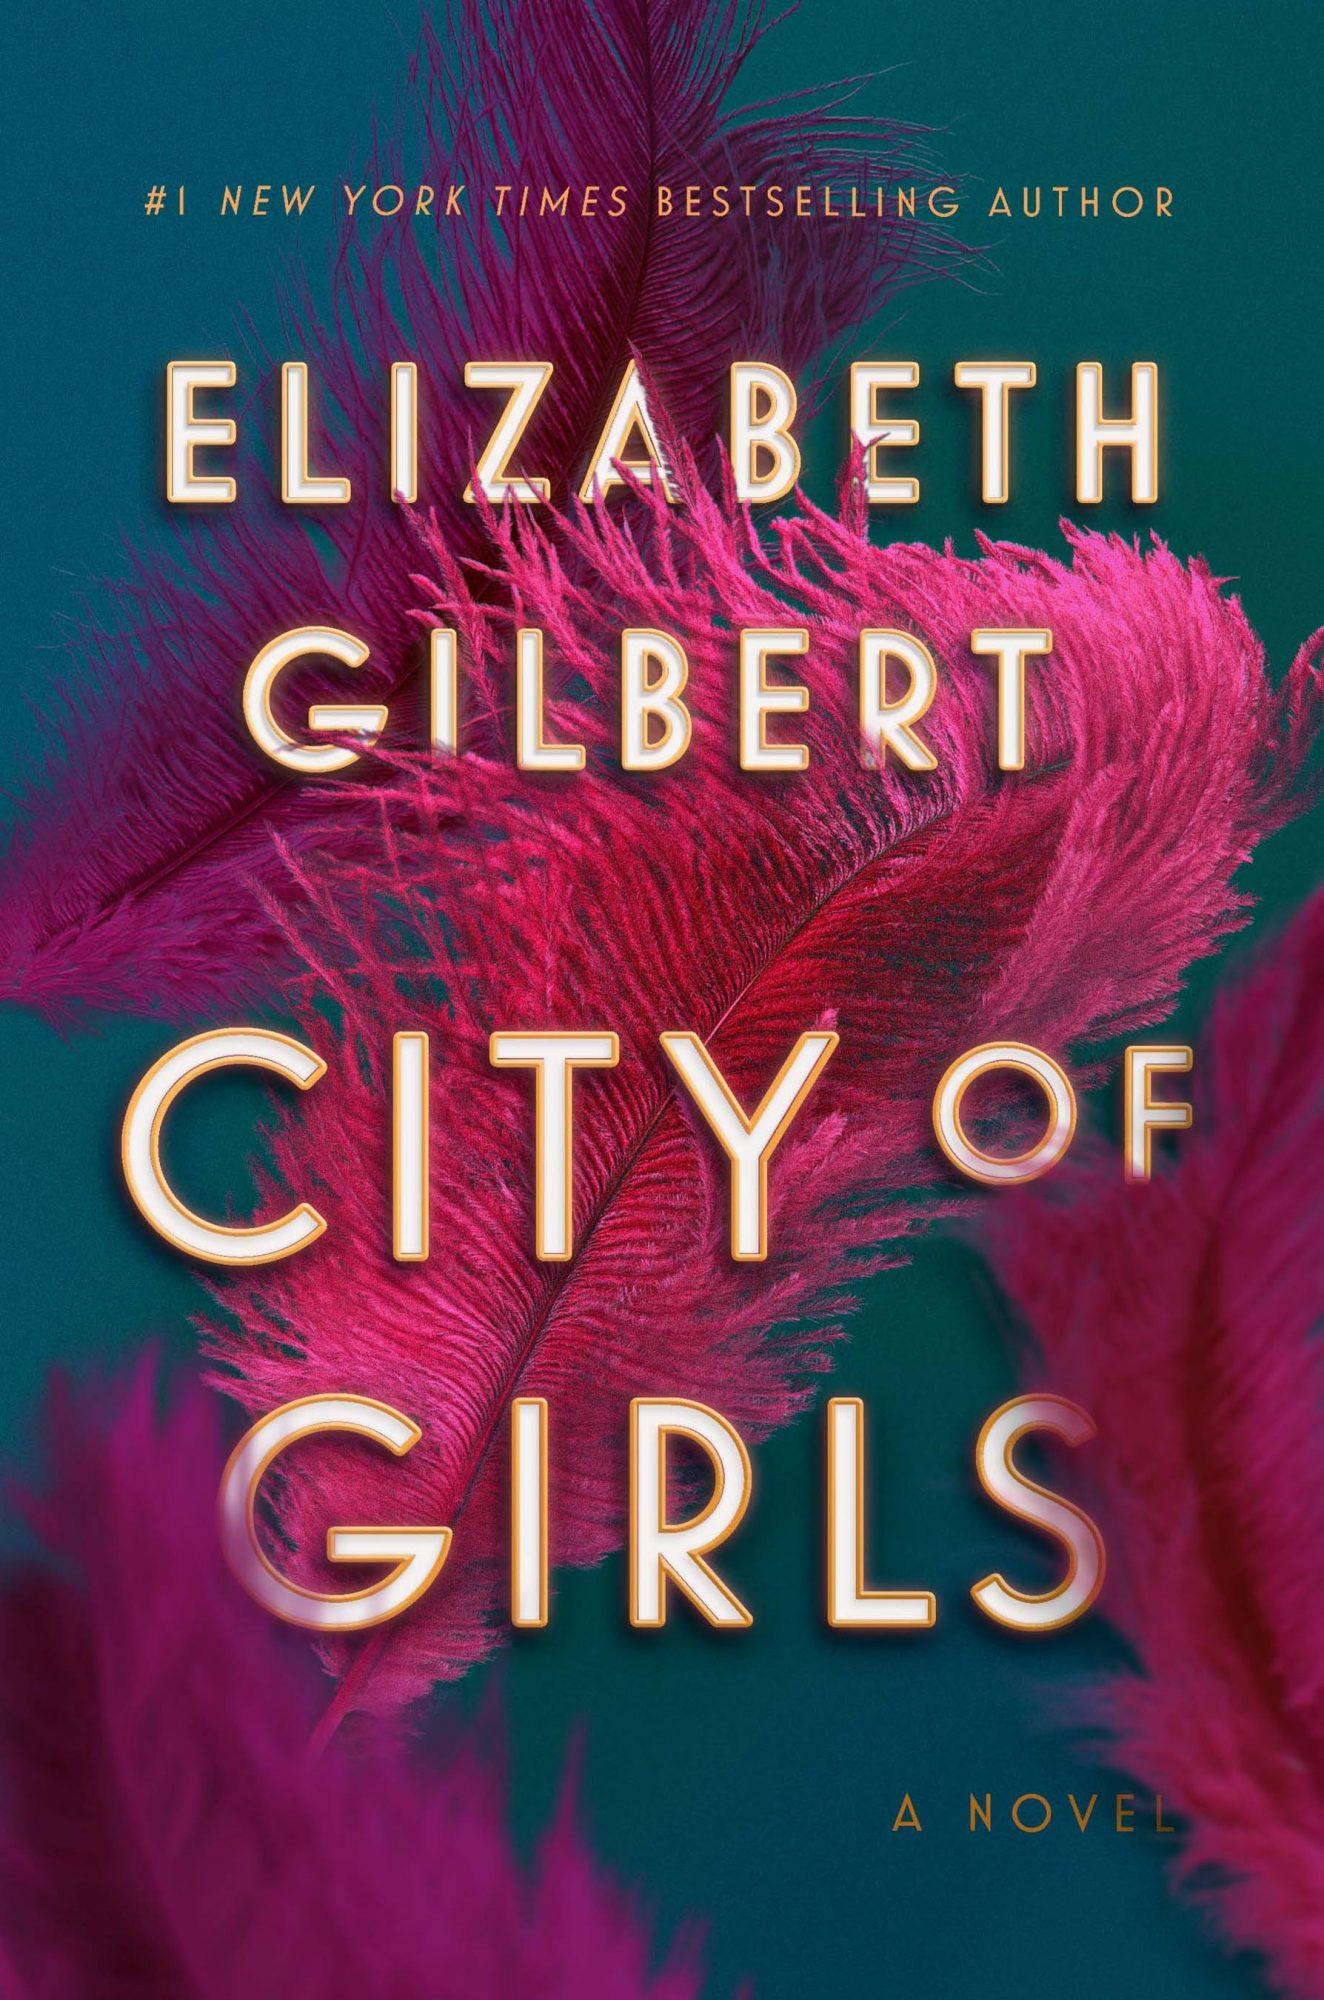 City of Girls (2019)Author: Elizabeth Gilbert